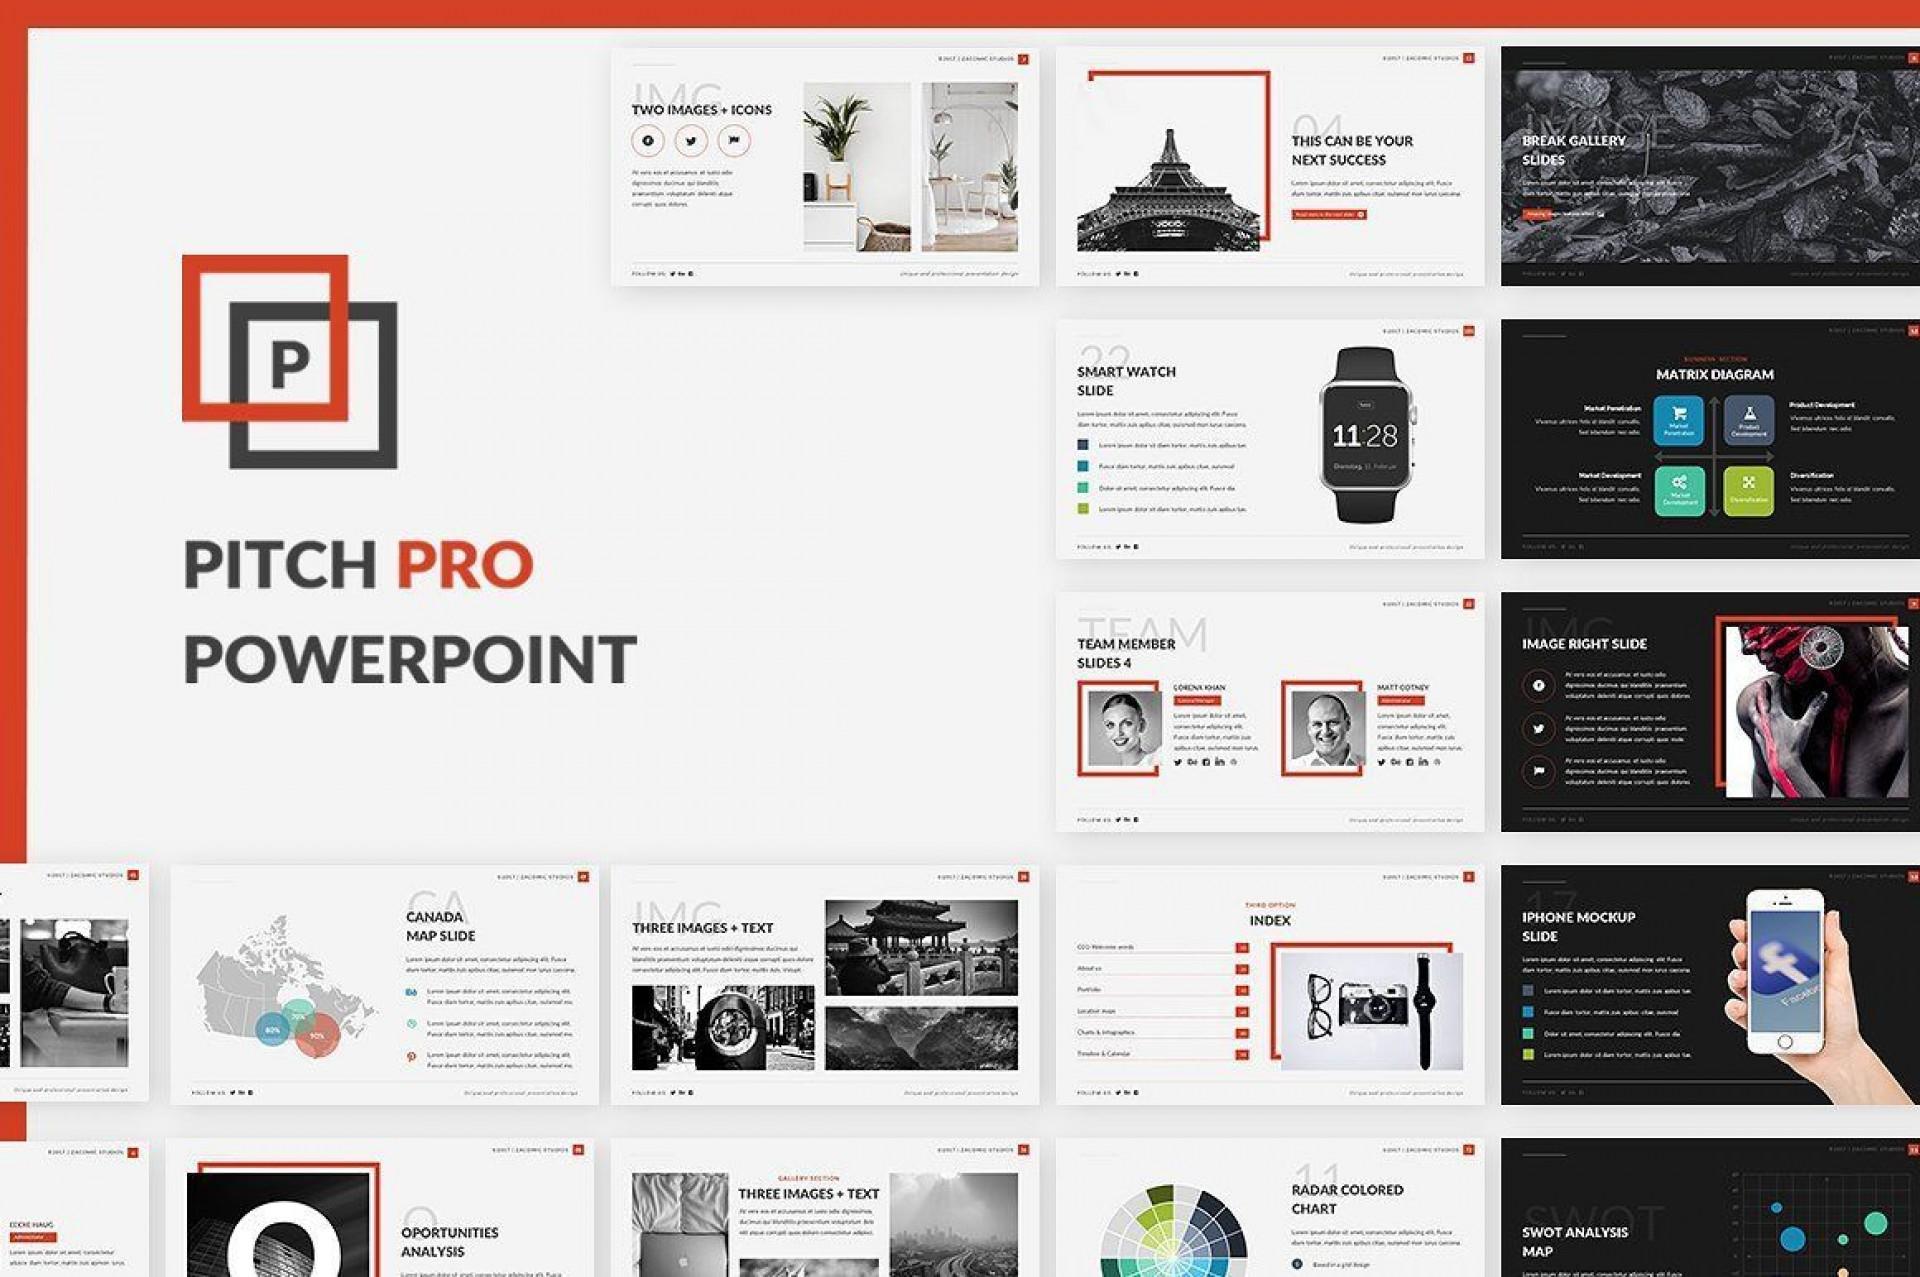 004 Rare Powerpoint Template For Mac Sample  Free Macbook Air Microsoft Download Theme1920